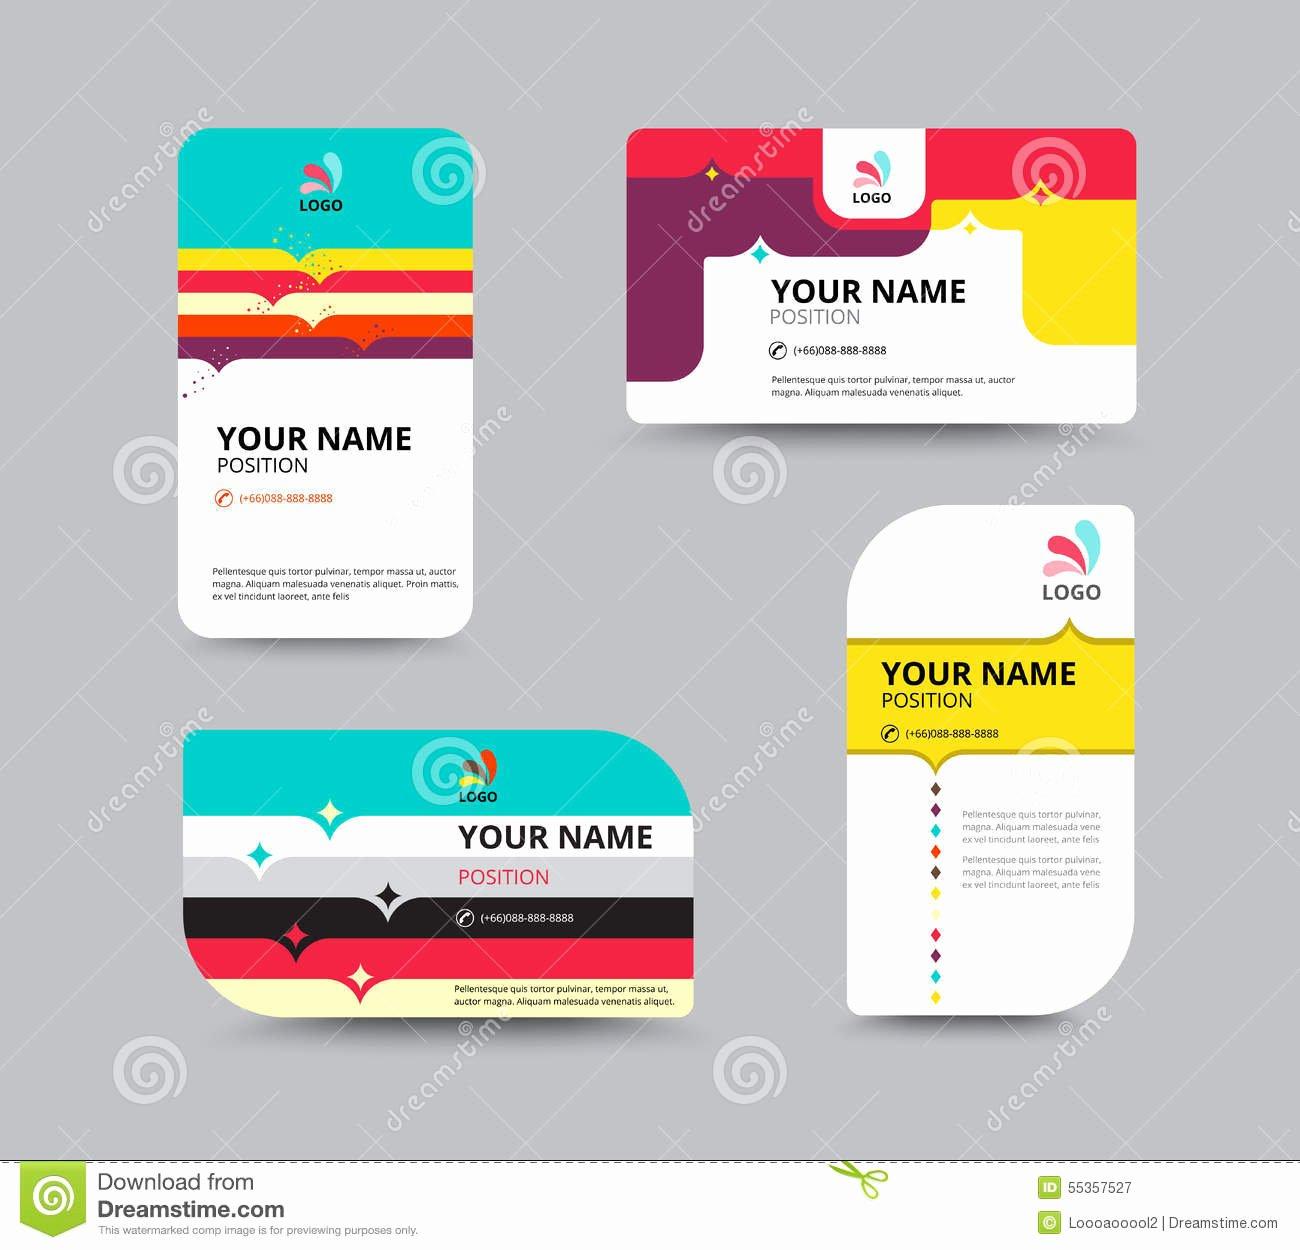 Business Card Layout Template Beautiful Business Card Template Business Card Layout Design